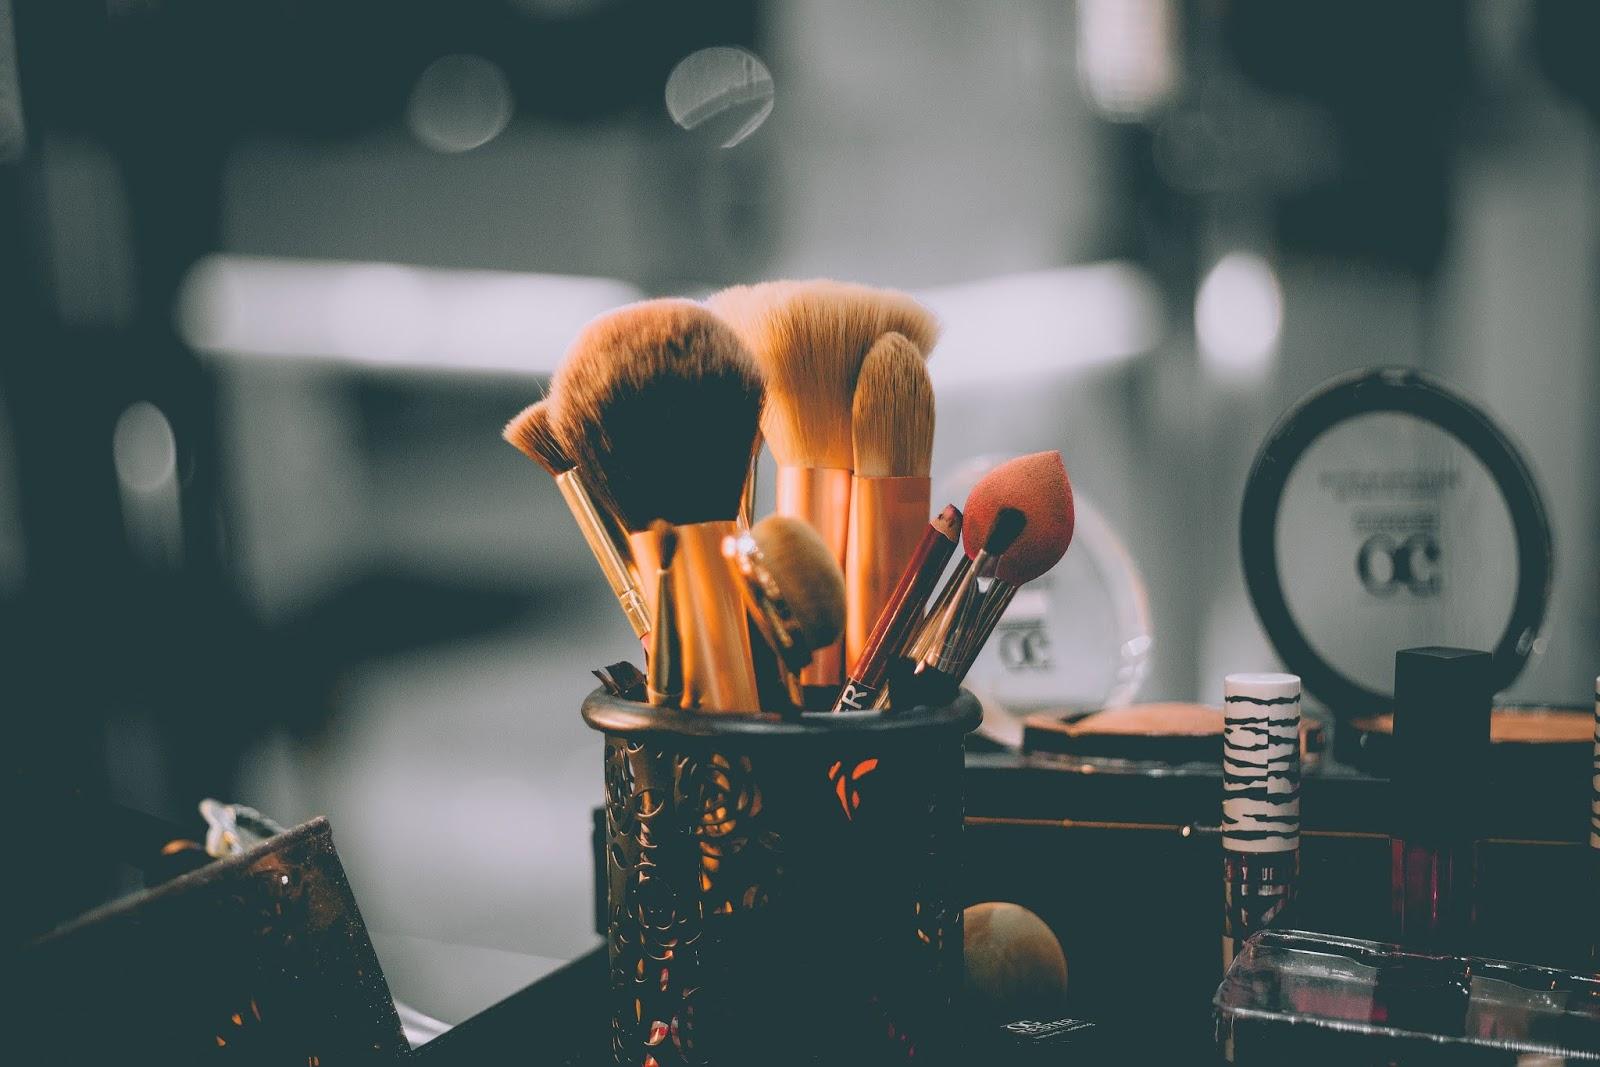 raphael lovaski pxax5WuM7eY unsplash - Tudo Sobre o seu Pincel de Maquiagem